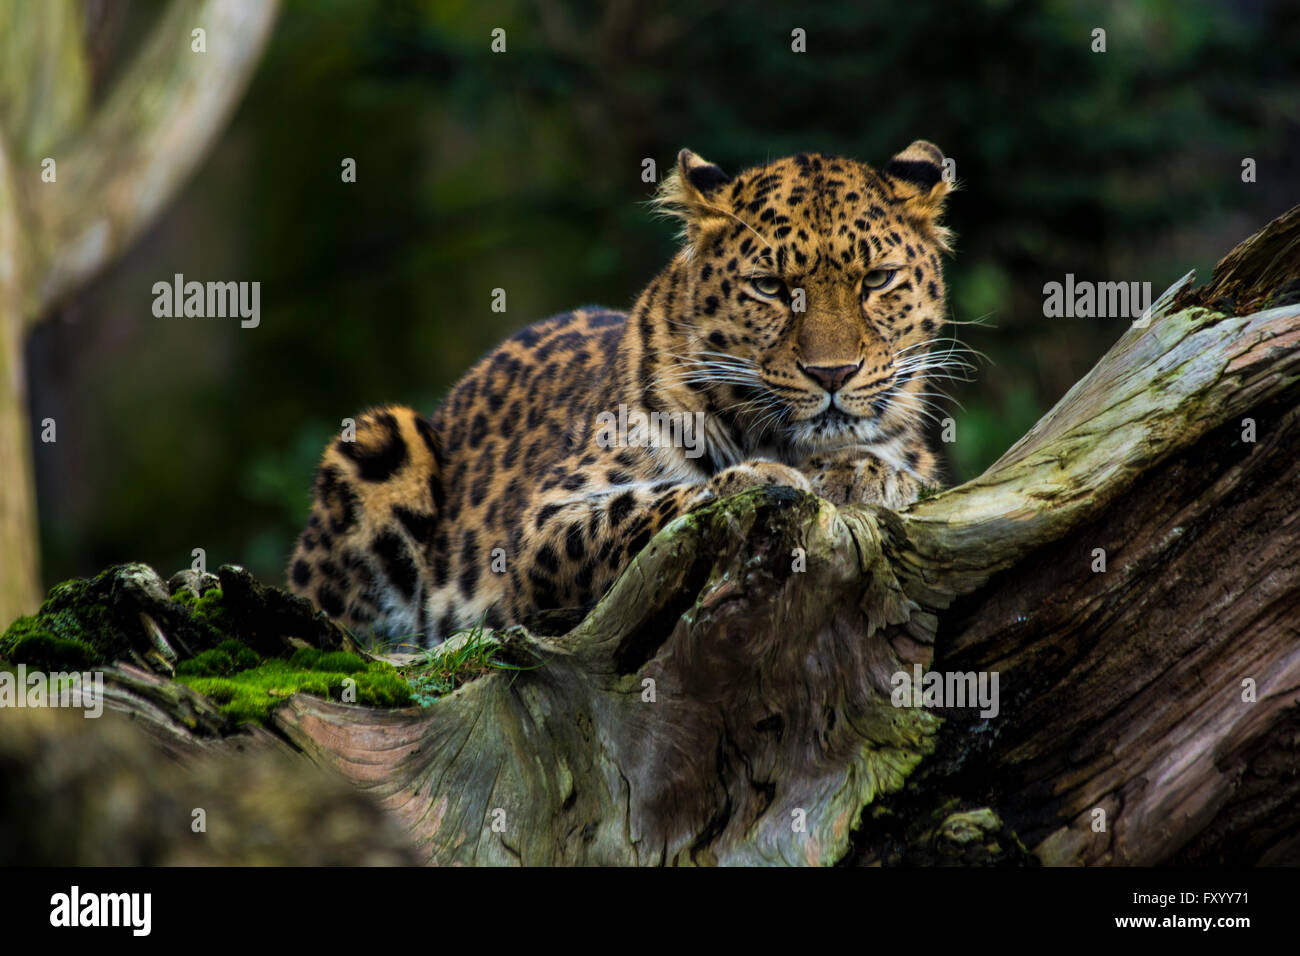 Amur Leopard (Panthera pardus orientalis) Lying Along a Log - Stock Image